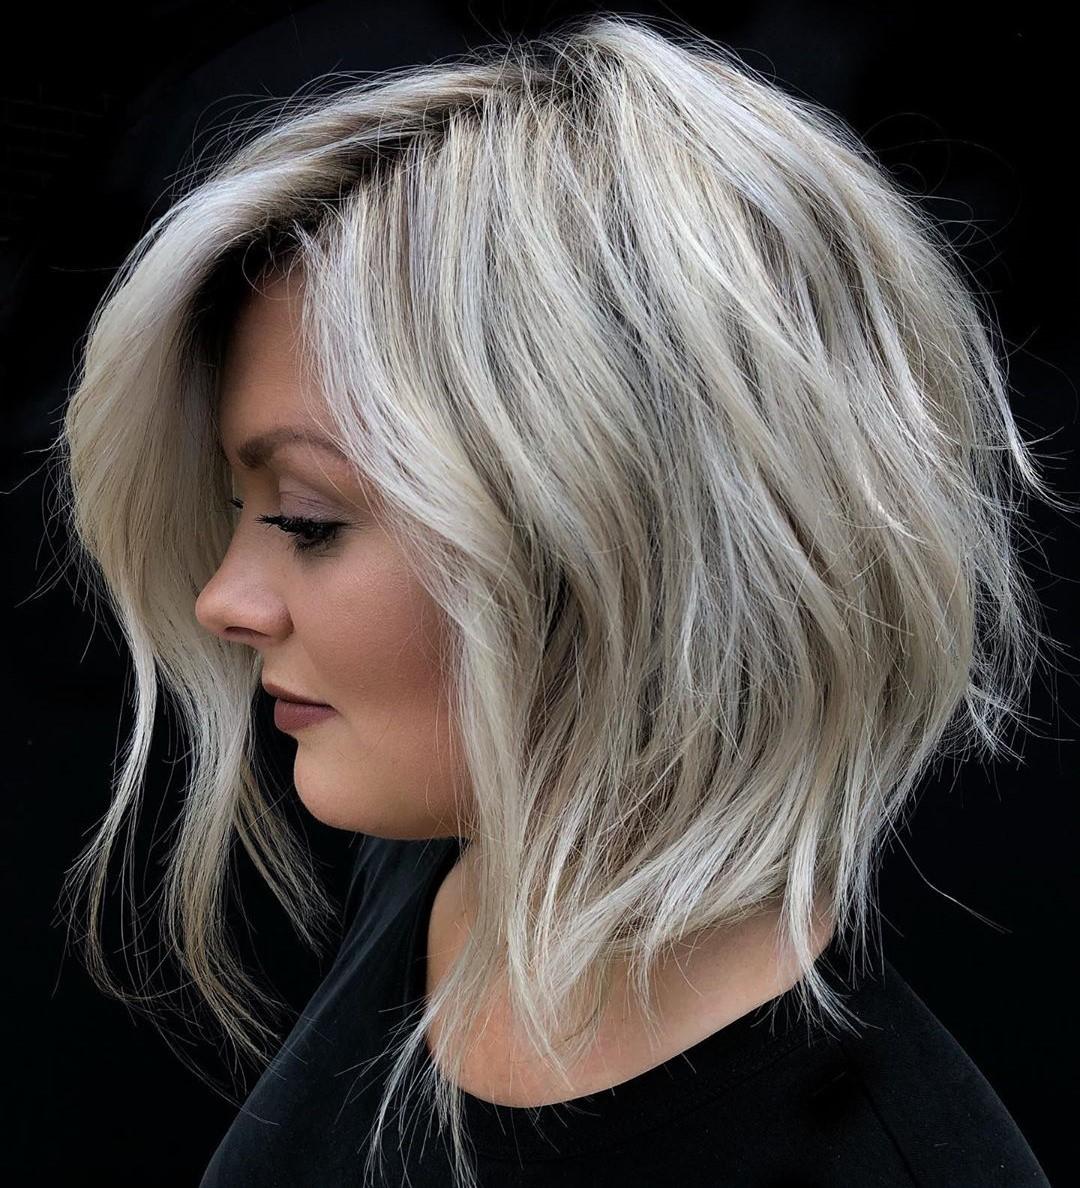 Blonde Layered Bob Haircut for Wavy Hair